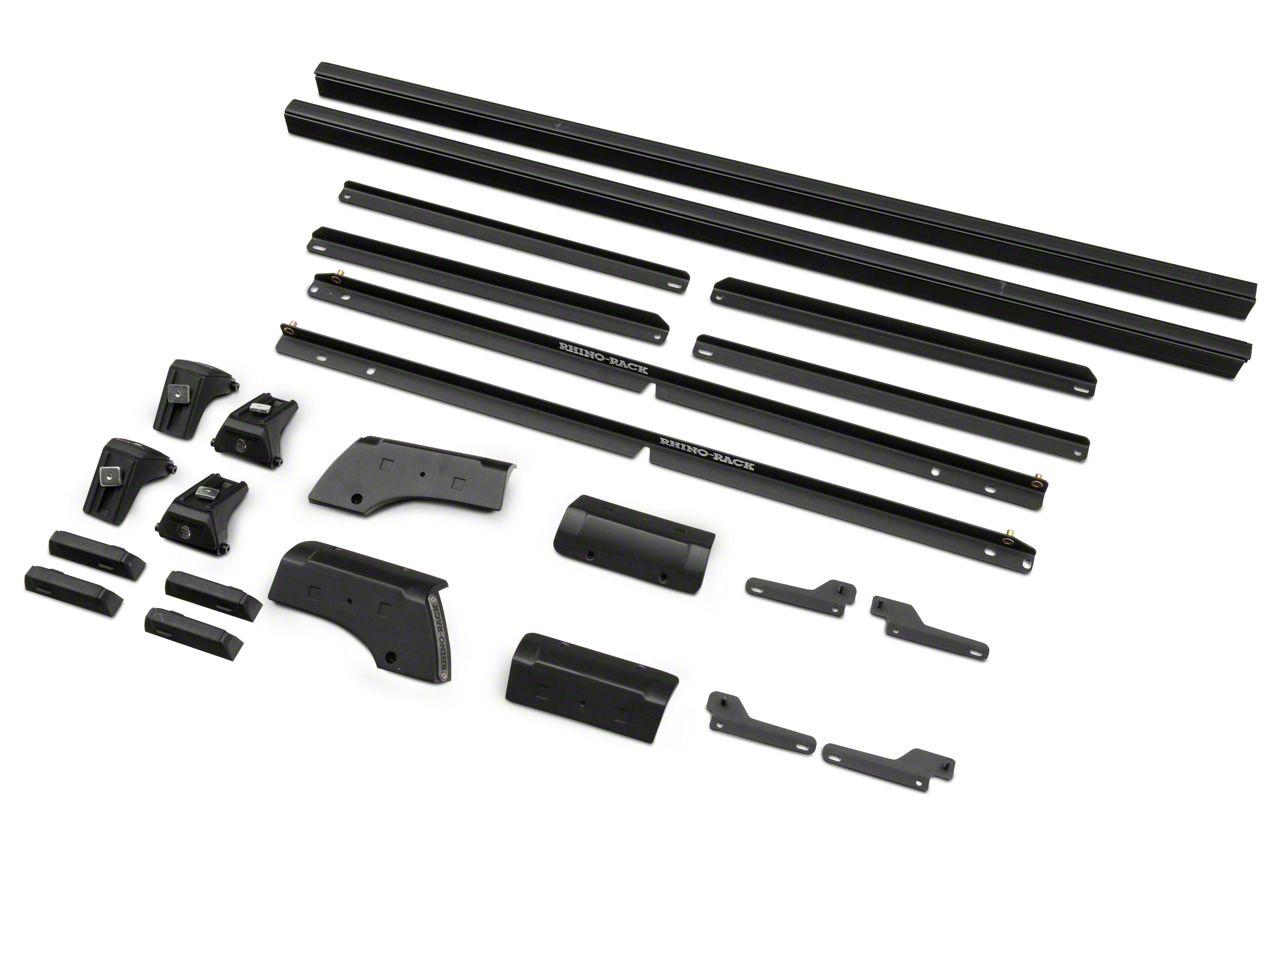 Rhino-Rack Heavy Duty RLT600 2-Bar Backbone Roof Rack - Black (07-18 Jeep Wrangler JK 2 Door)